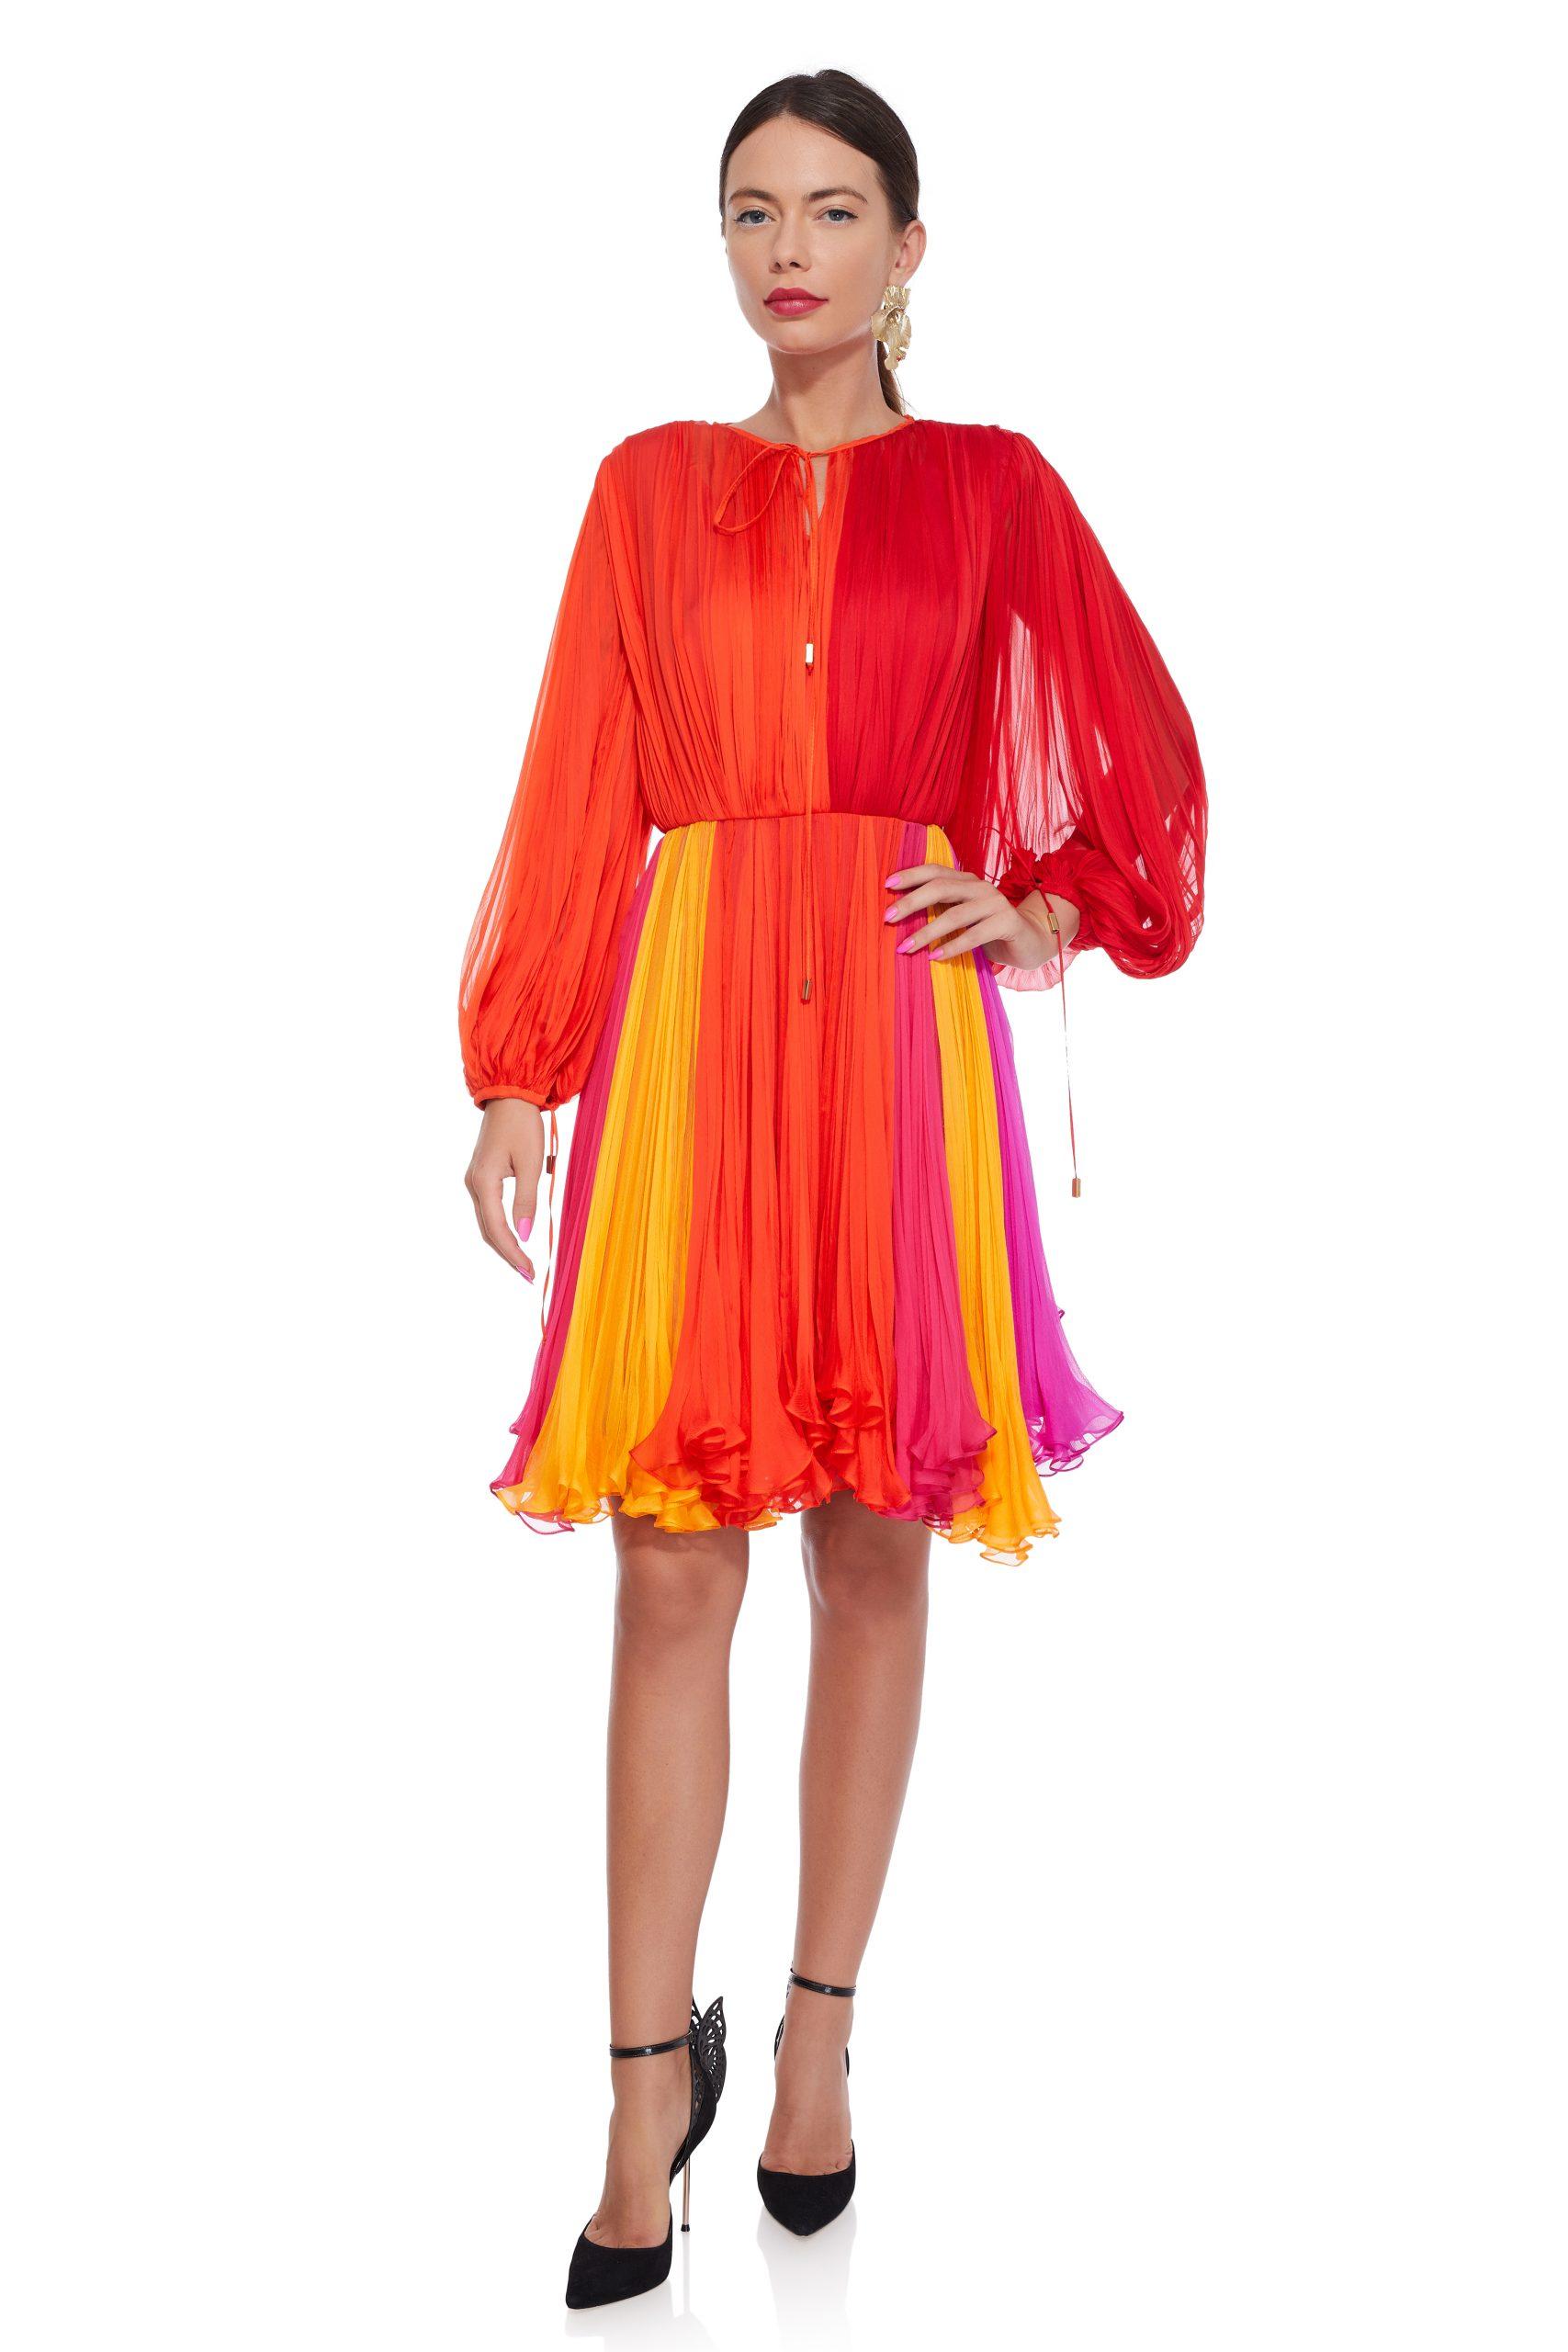 Multicolored silk cocktail dress